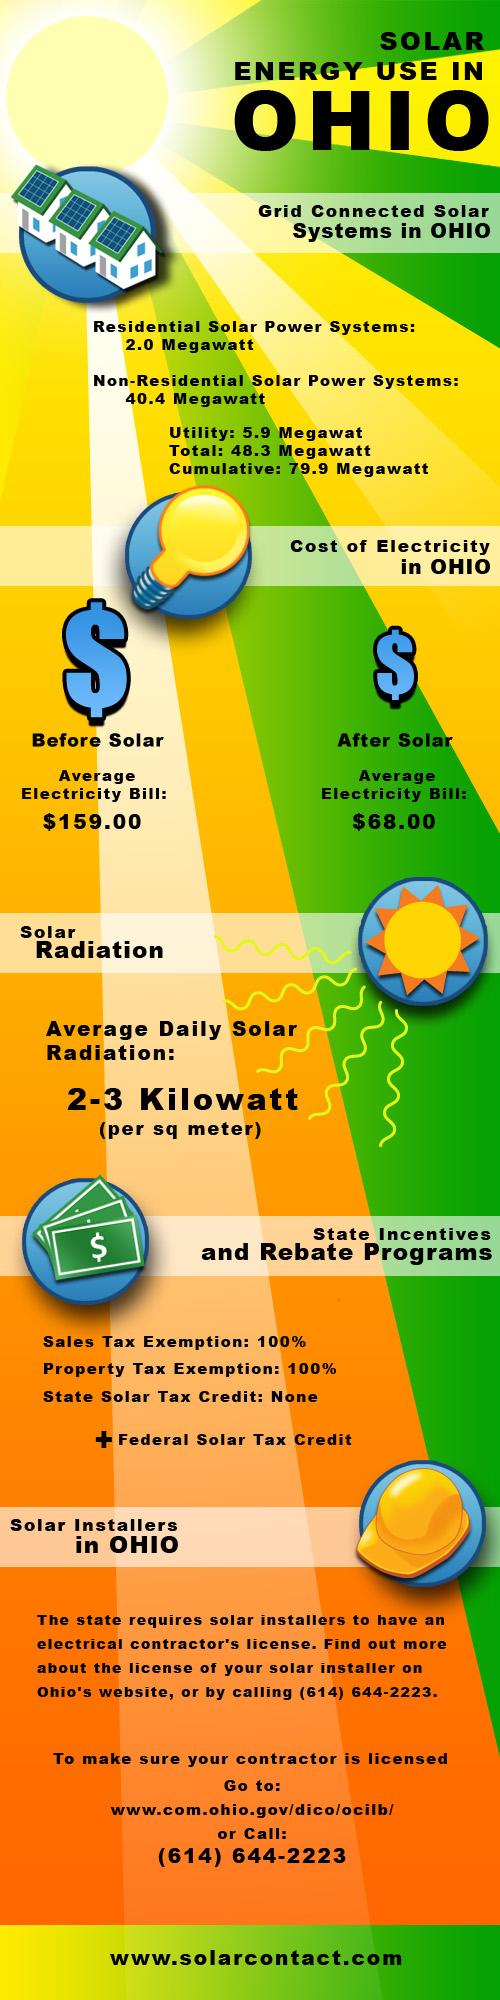 Fact Sheet Solar Energy Use in Ohio